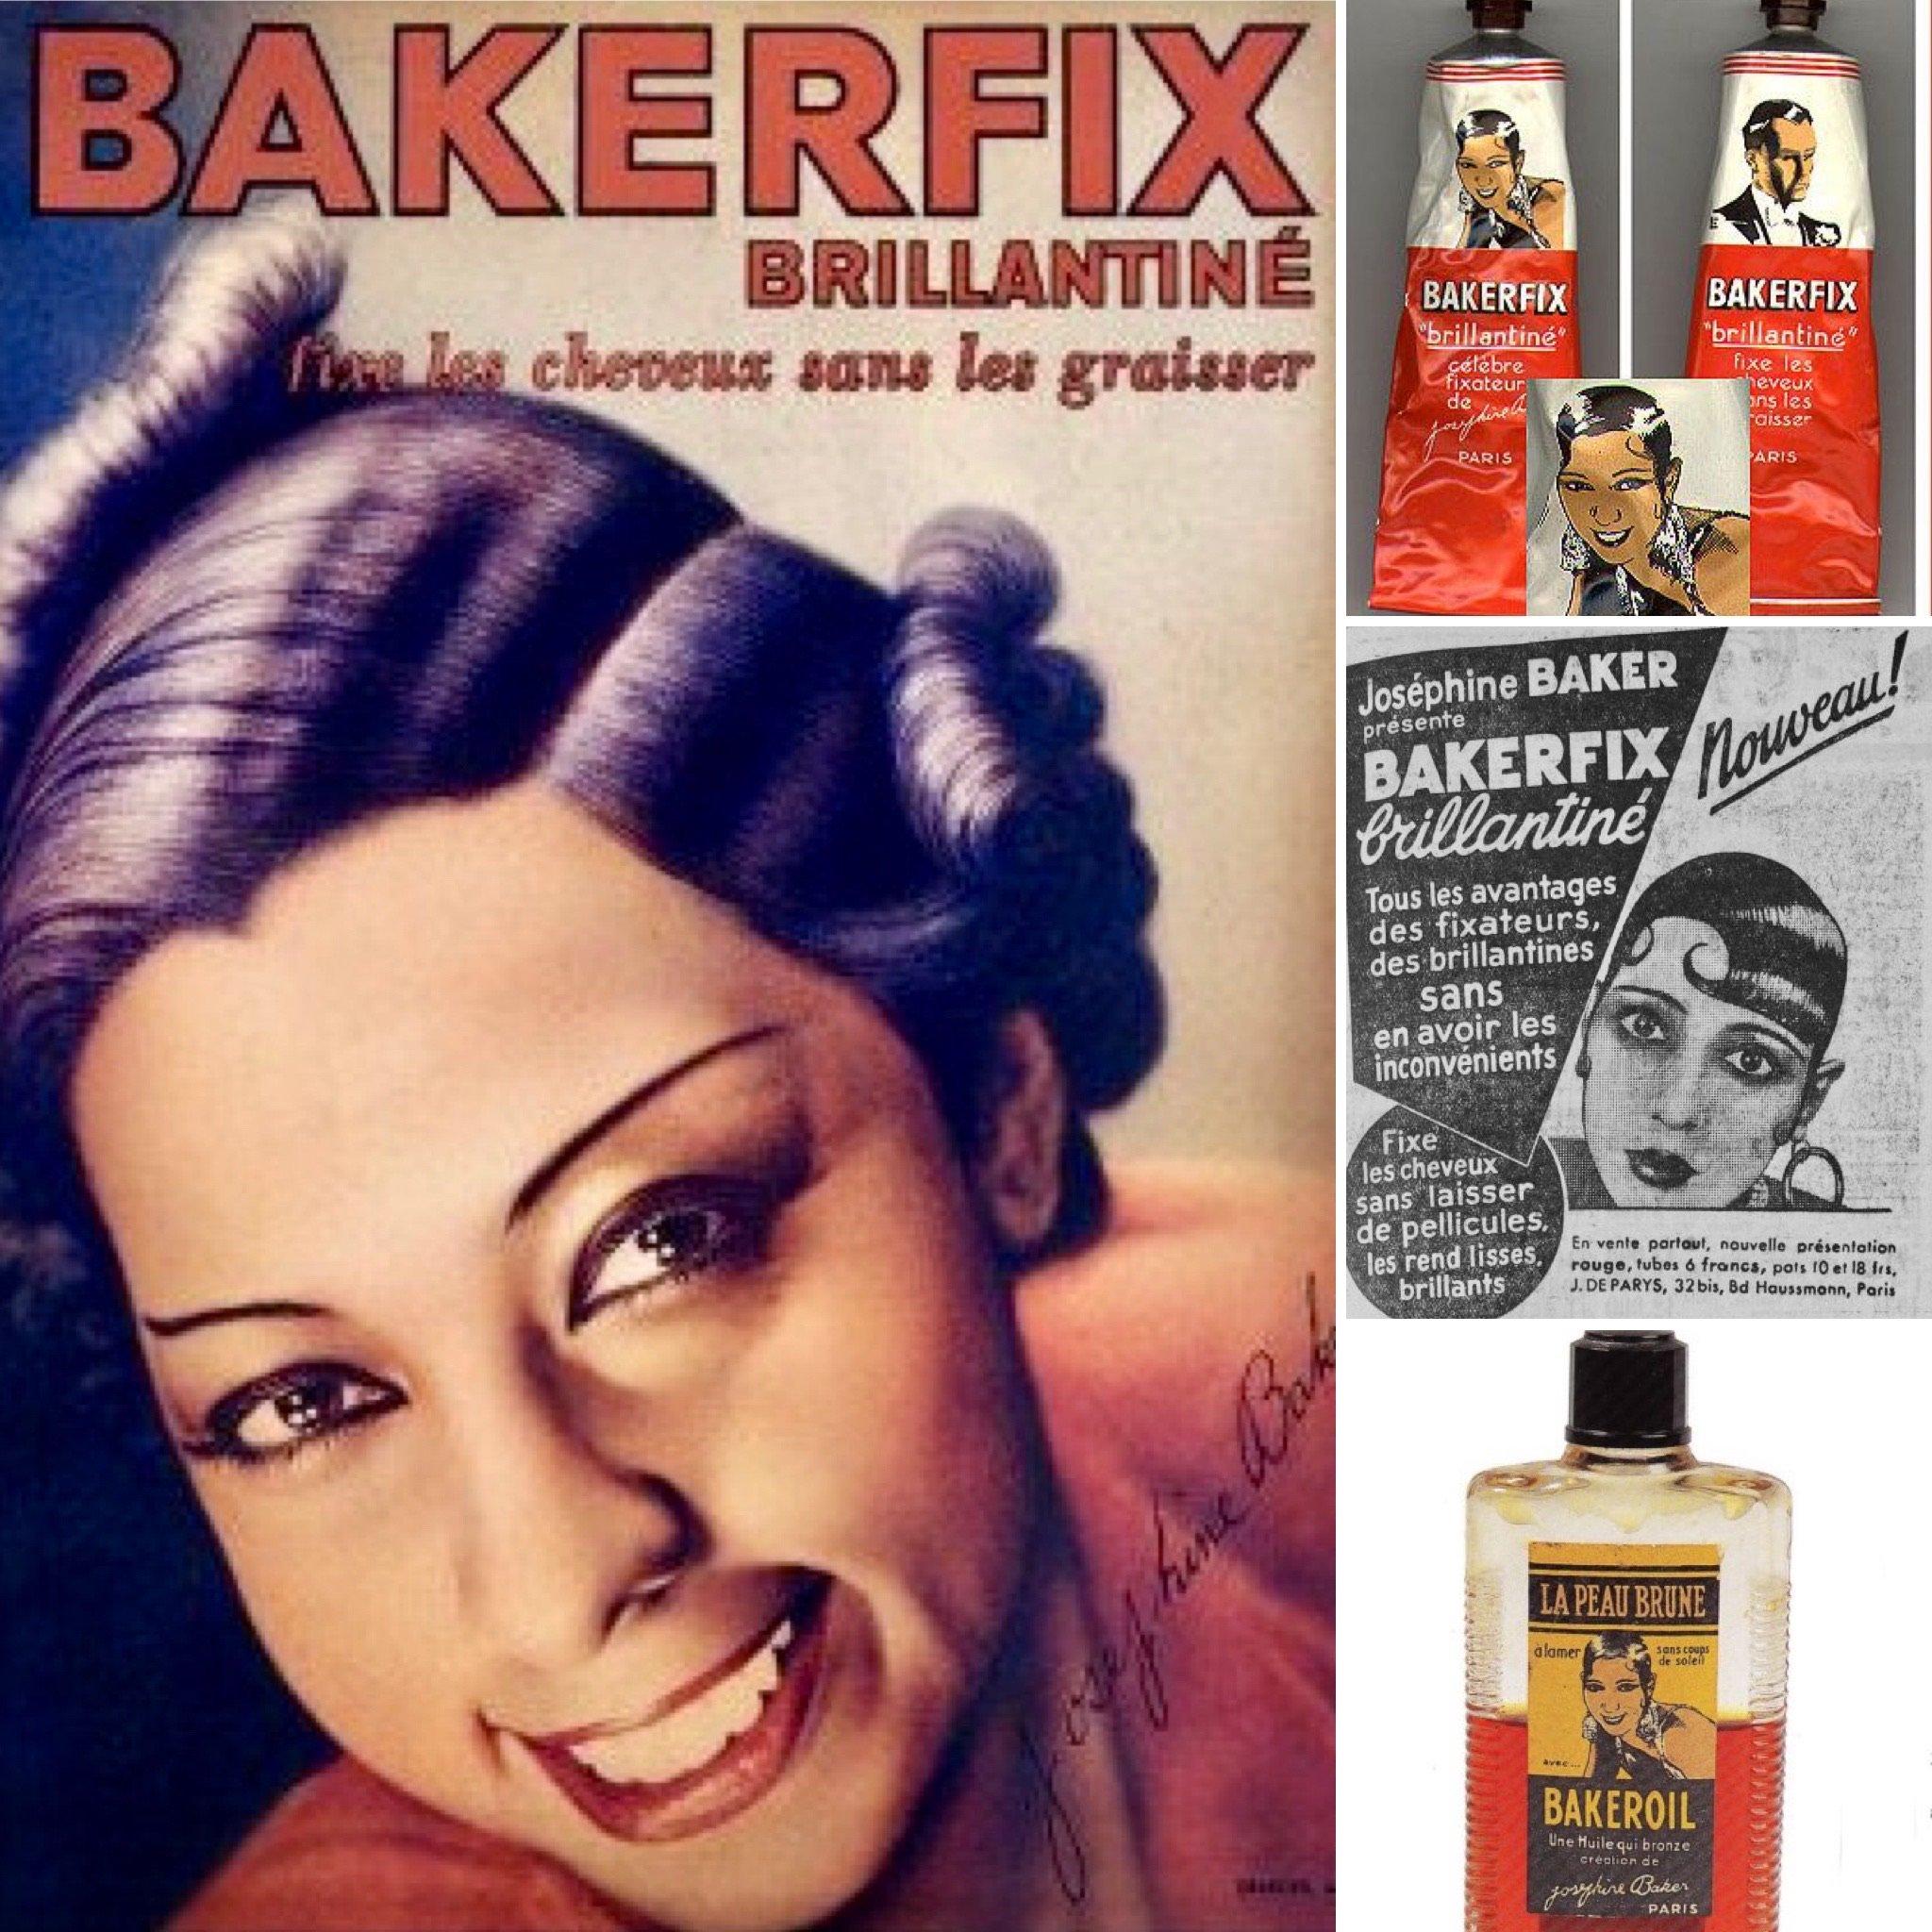 prodotti Baker